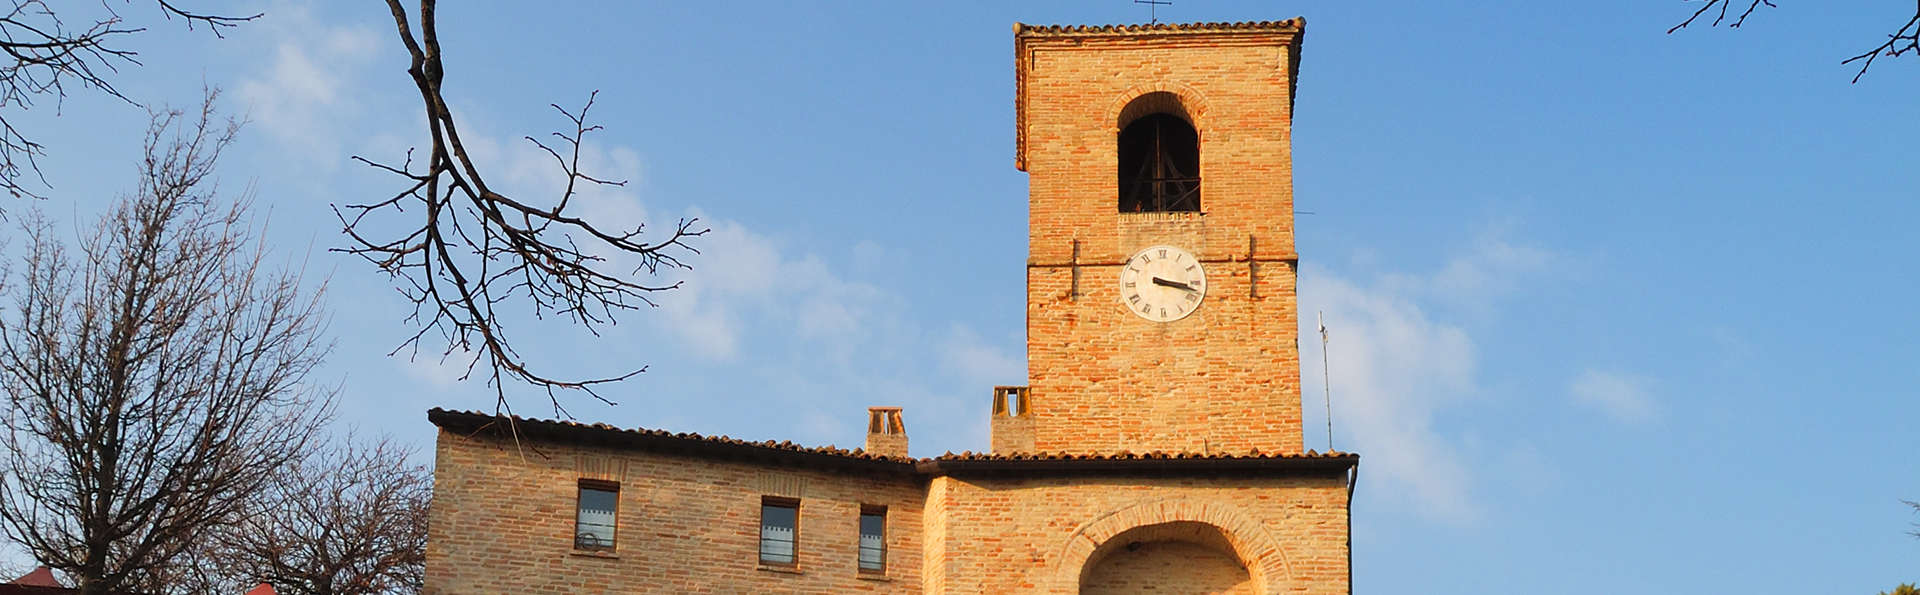 Castello di Montegridolfo Spa Resort - Edit_Destinatio2n.jpg